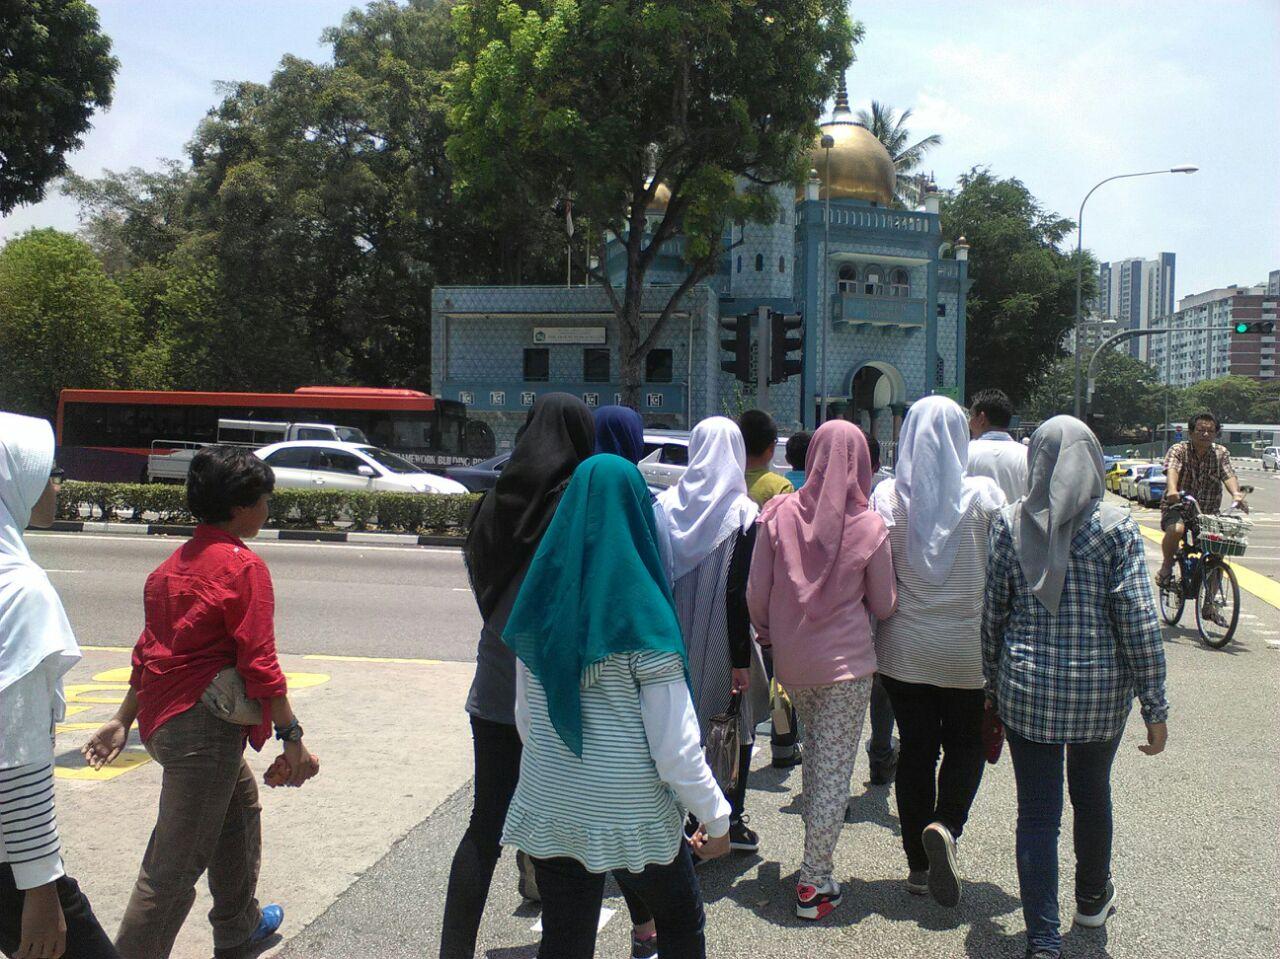 wisata singapura malaysia 2016 (11)